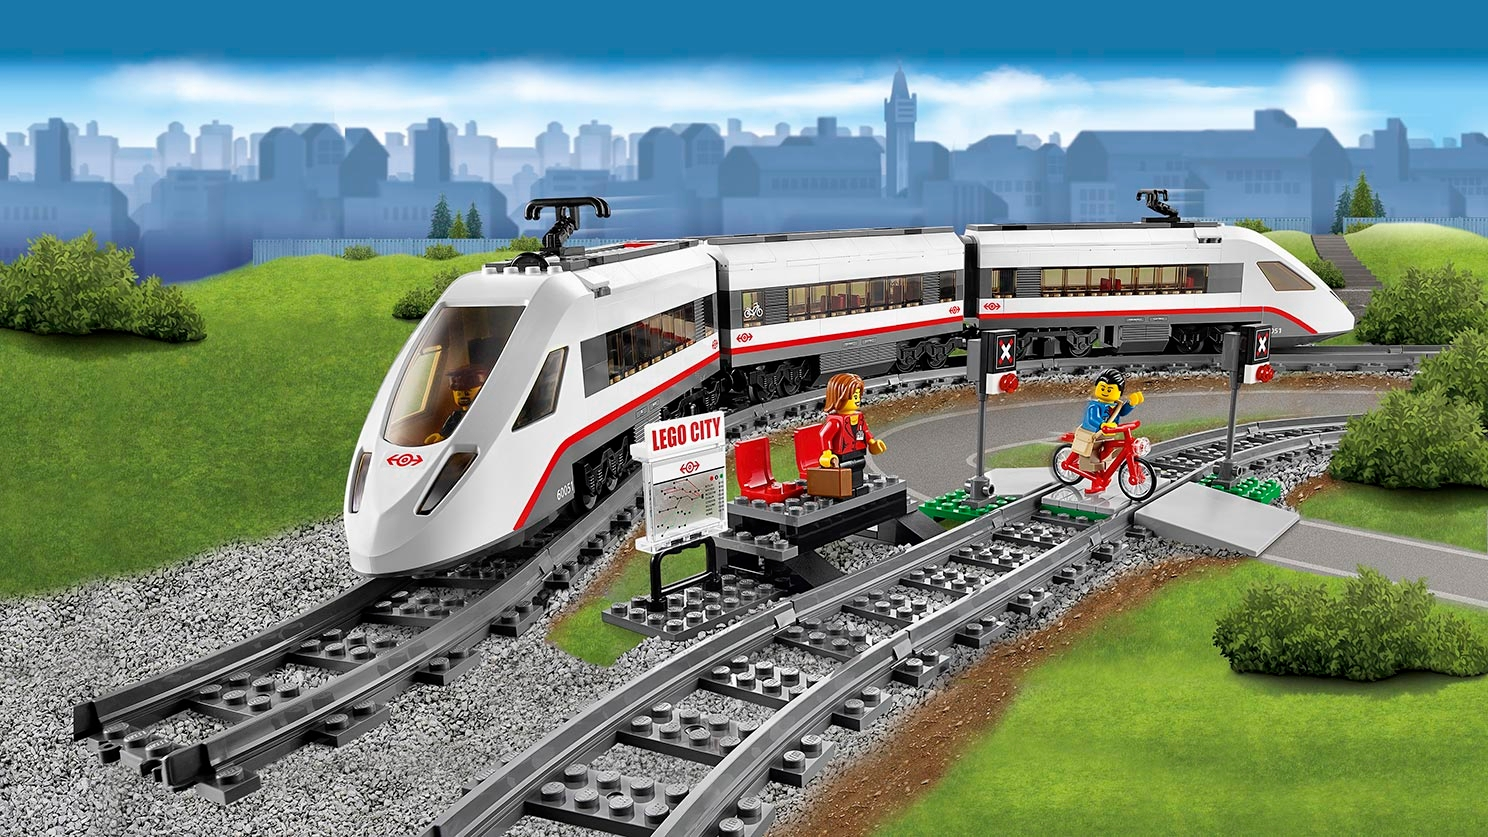 LEGO City train on tracks - High-Speed Passenger Train 60051